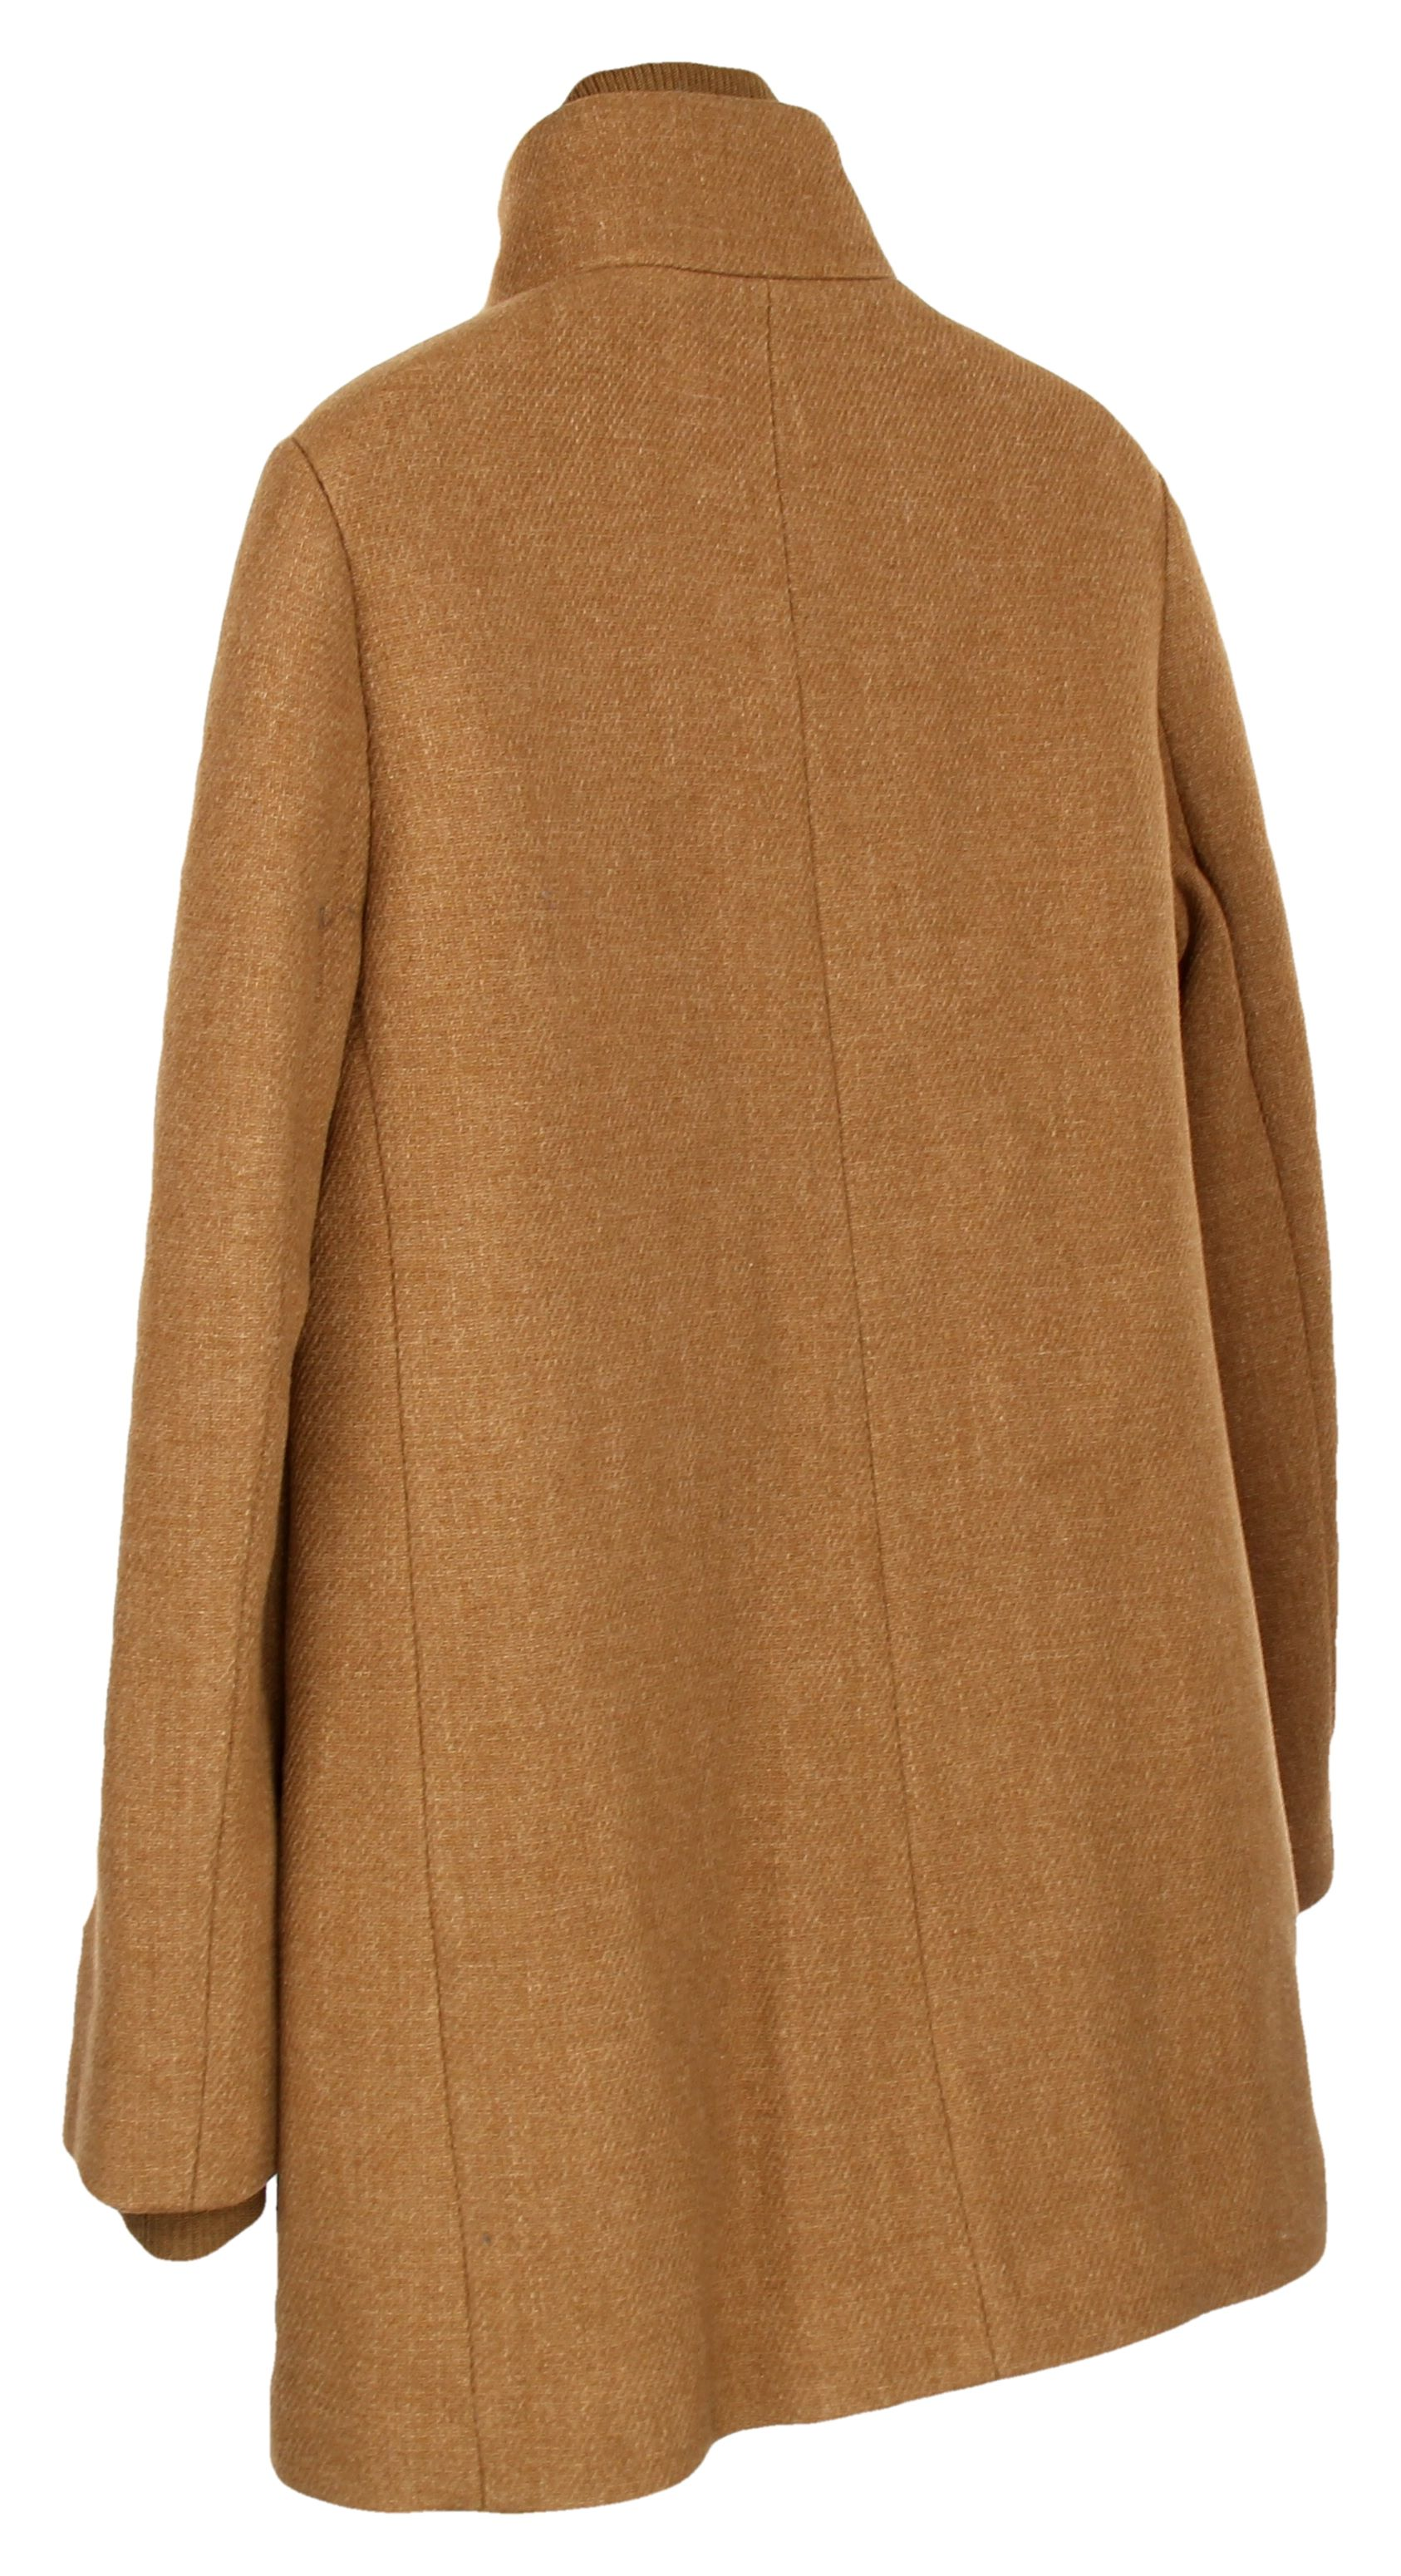 J Crew Womens Lodge Coat Italian Stadium-Cloth Wool Coat Heather Acorn 14 K0896